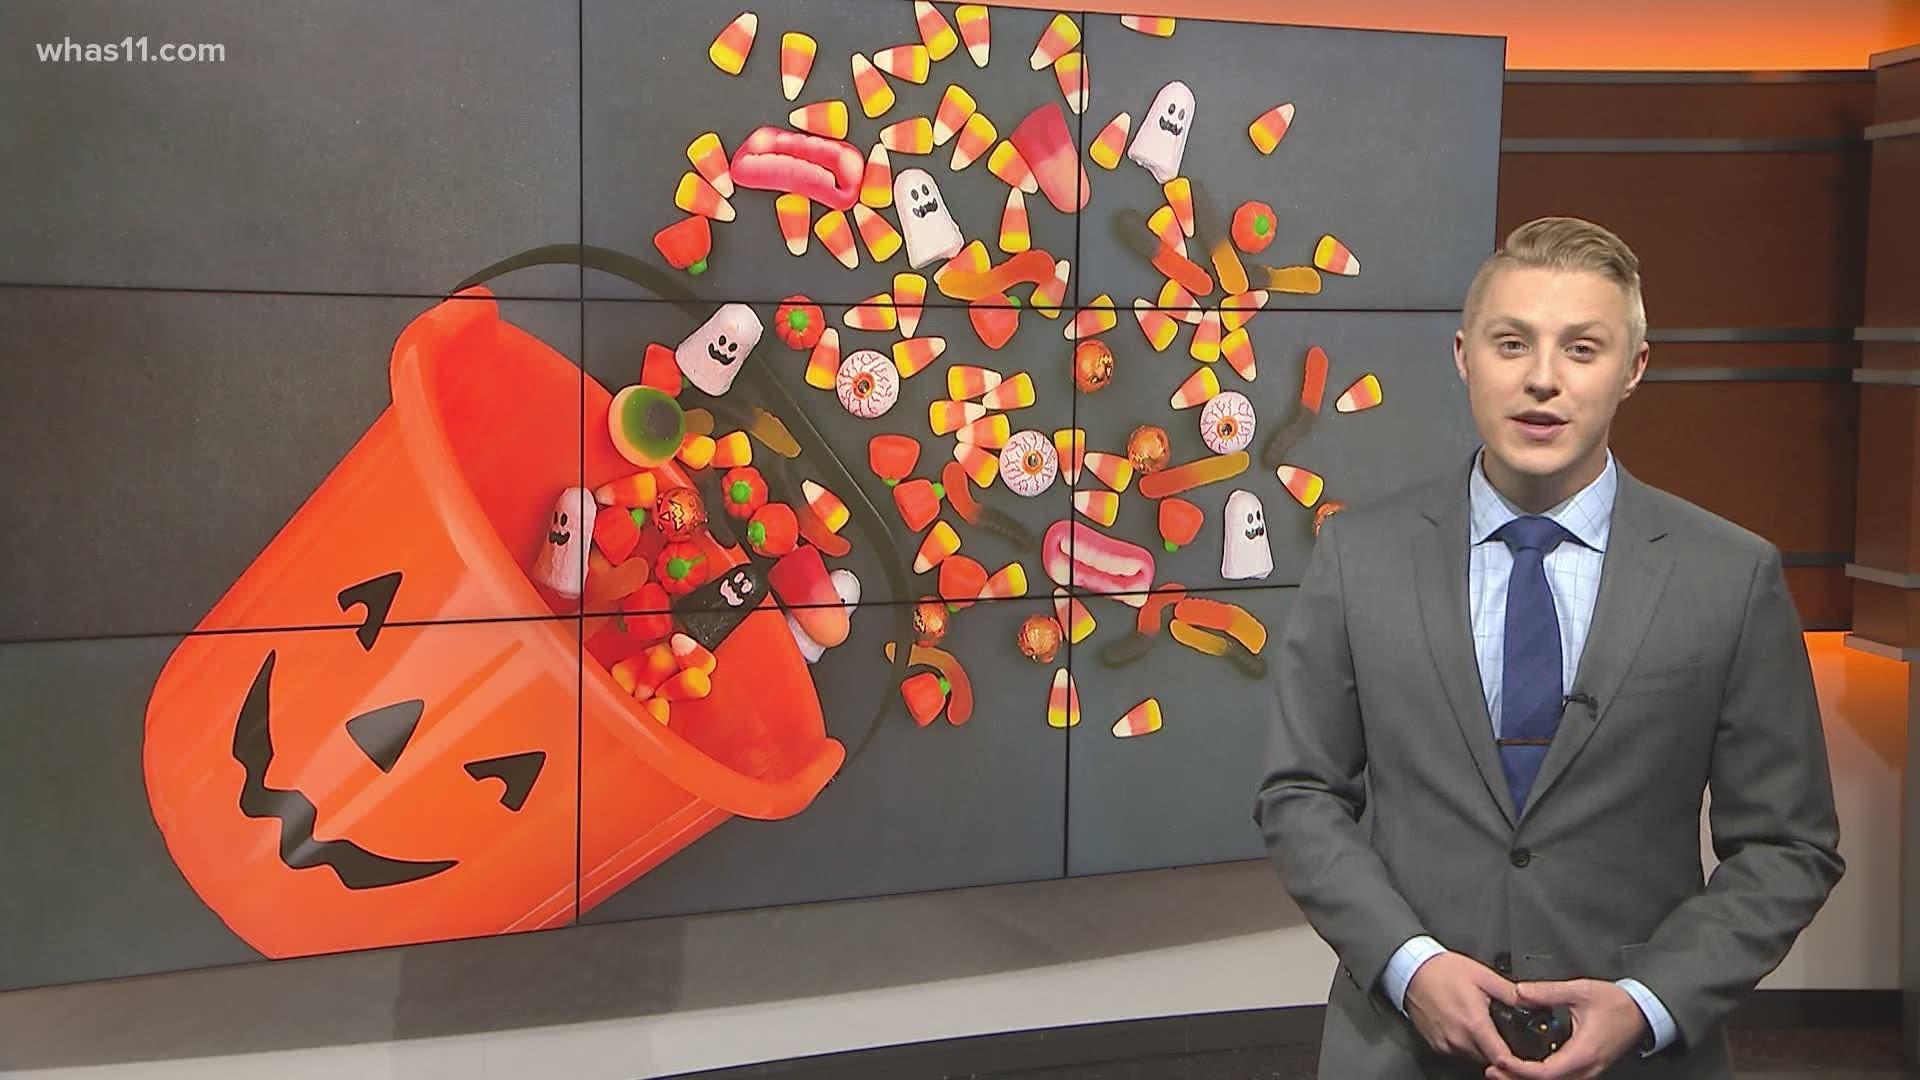 Halloween 2020 In Louisville Ky What is Freeform's 31 Nights of Halloween schedule for 2020